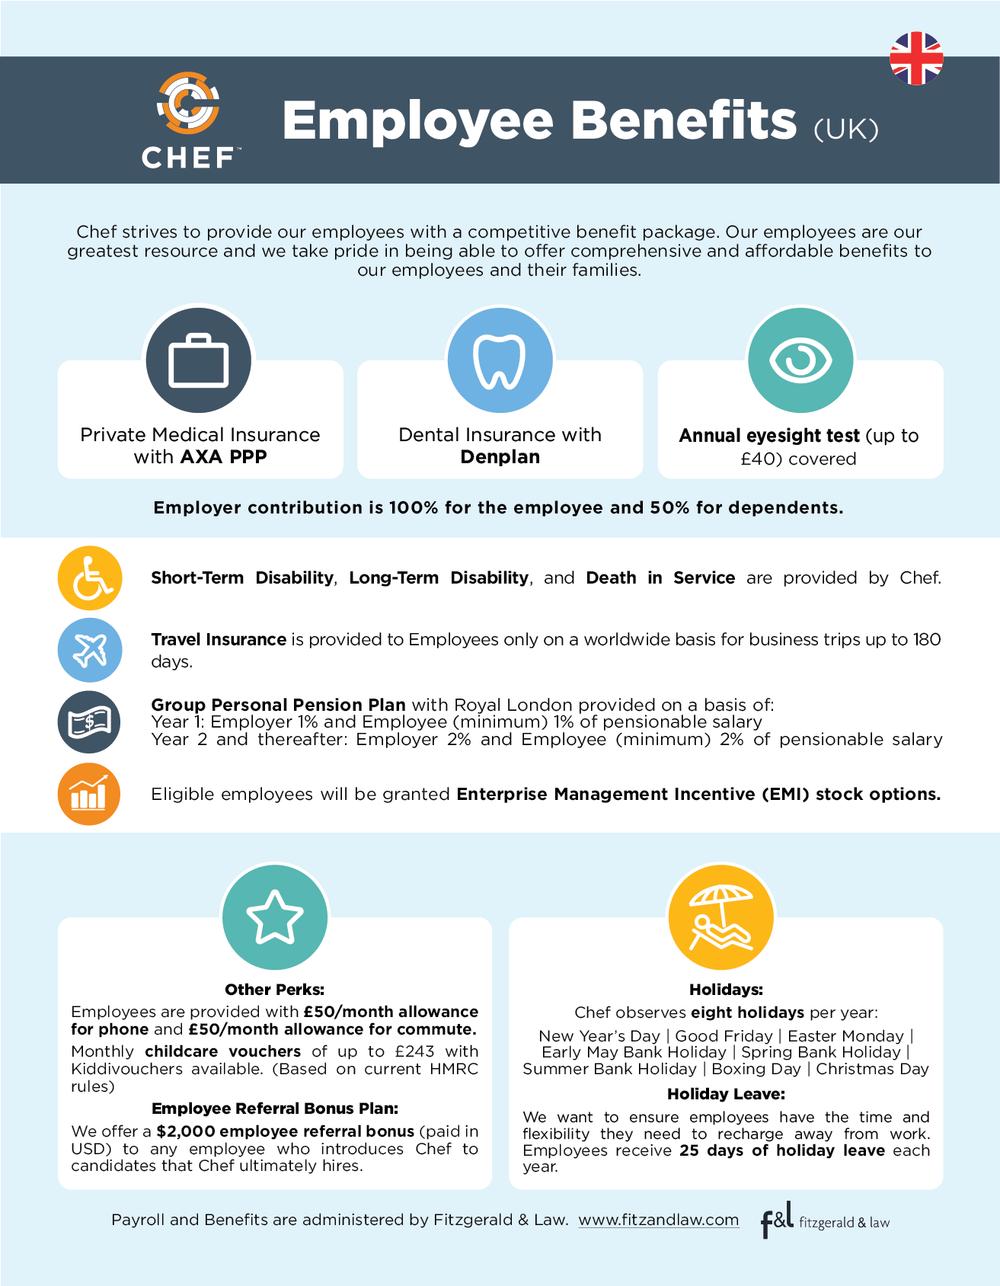 chef employee benefits amanda mccammon us and uk benefits summary infographic design for chef software